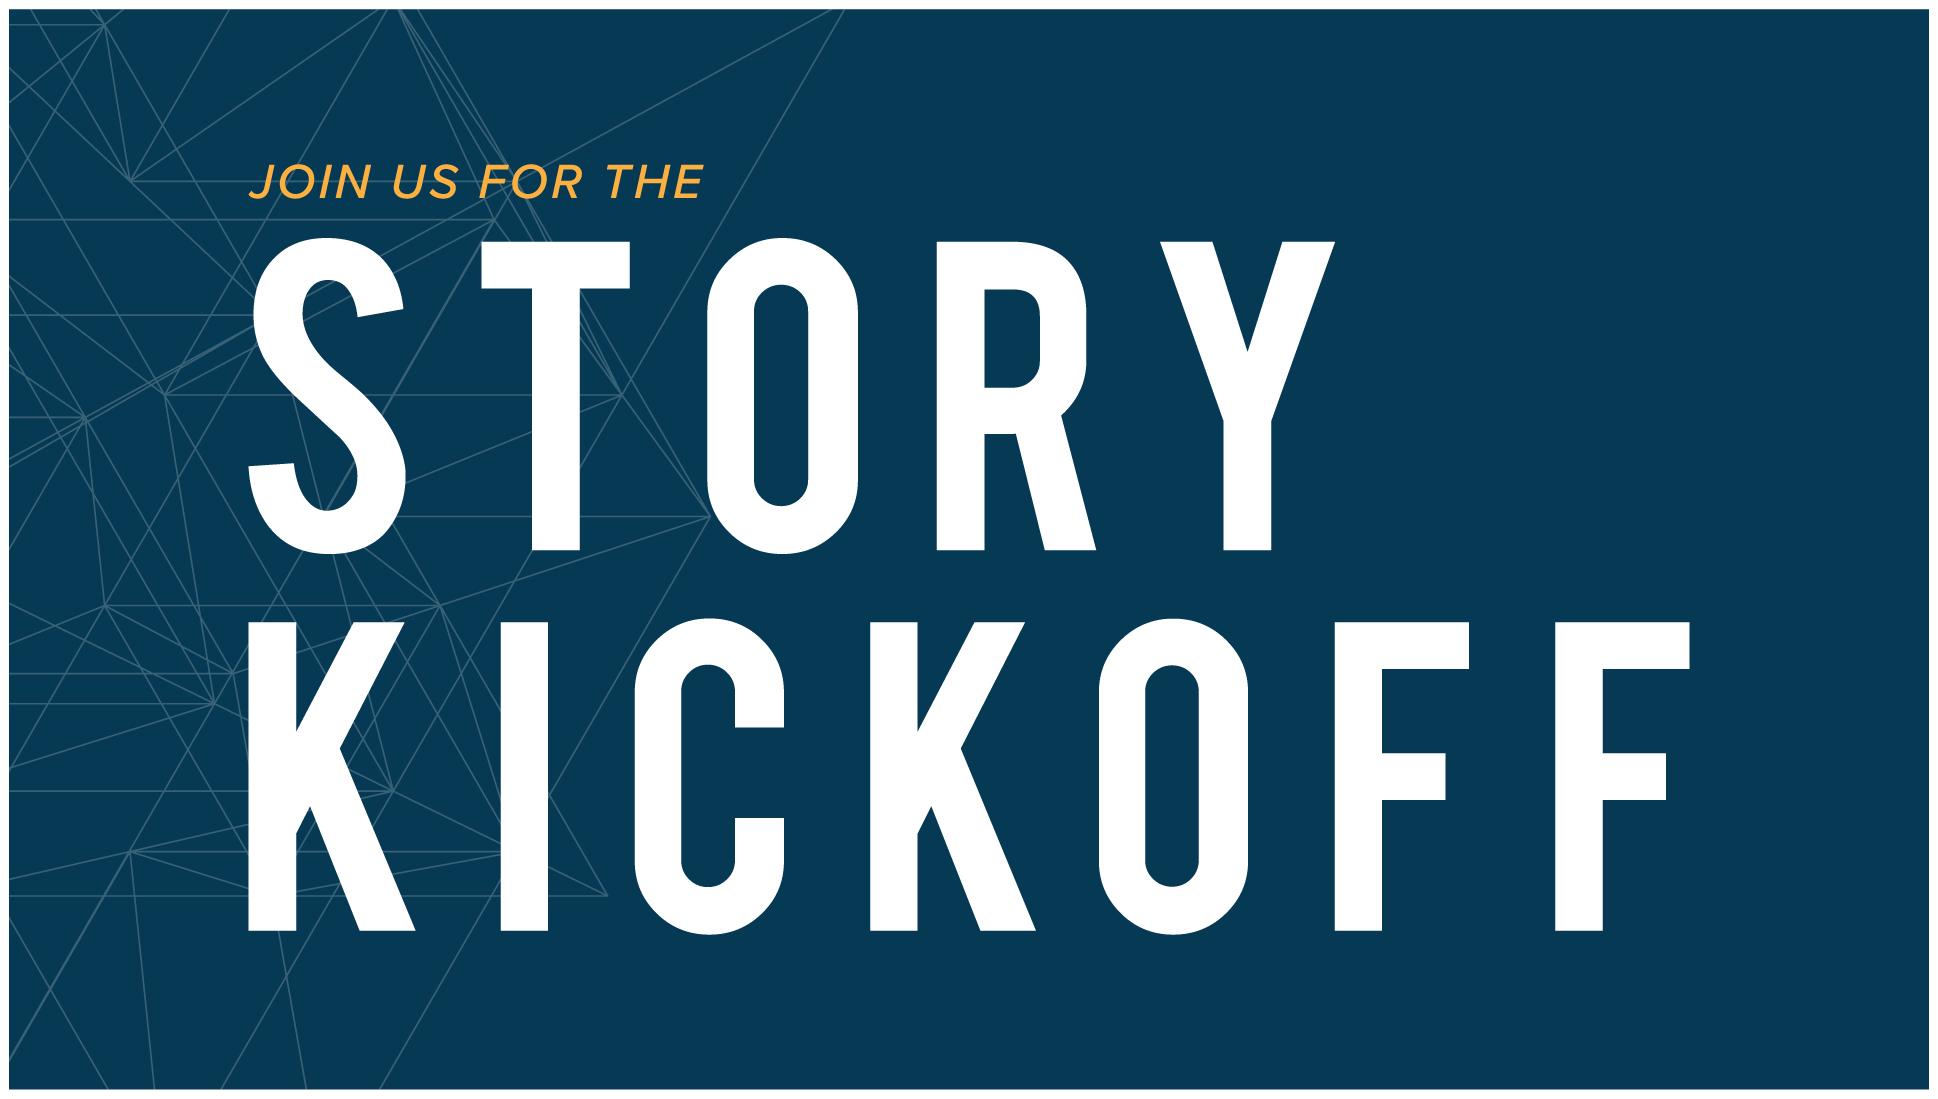 storykickoff-1920x1080-eventpageheader.jpg